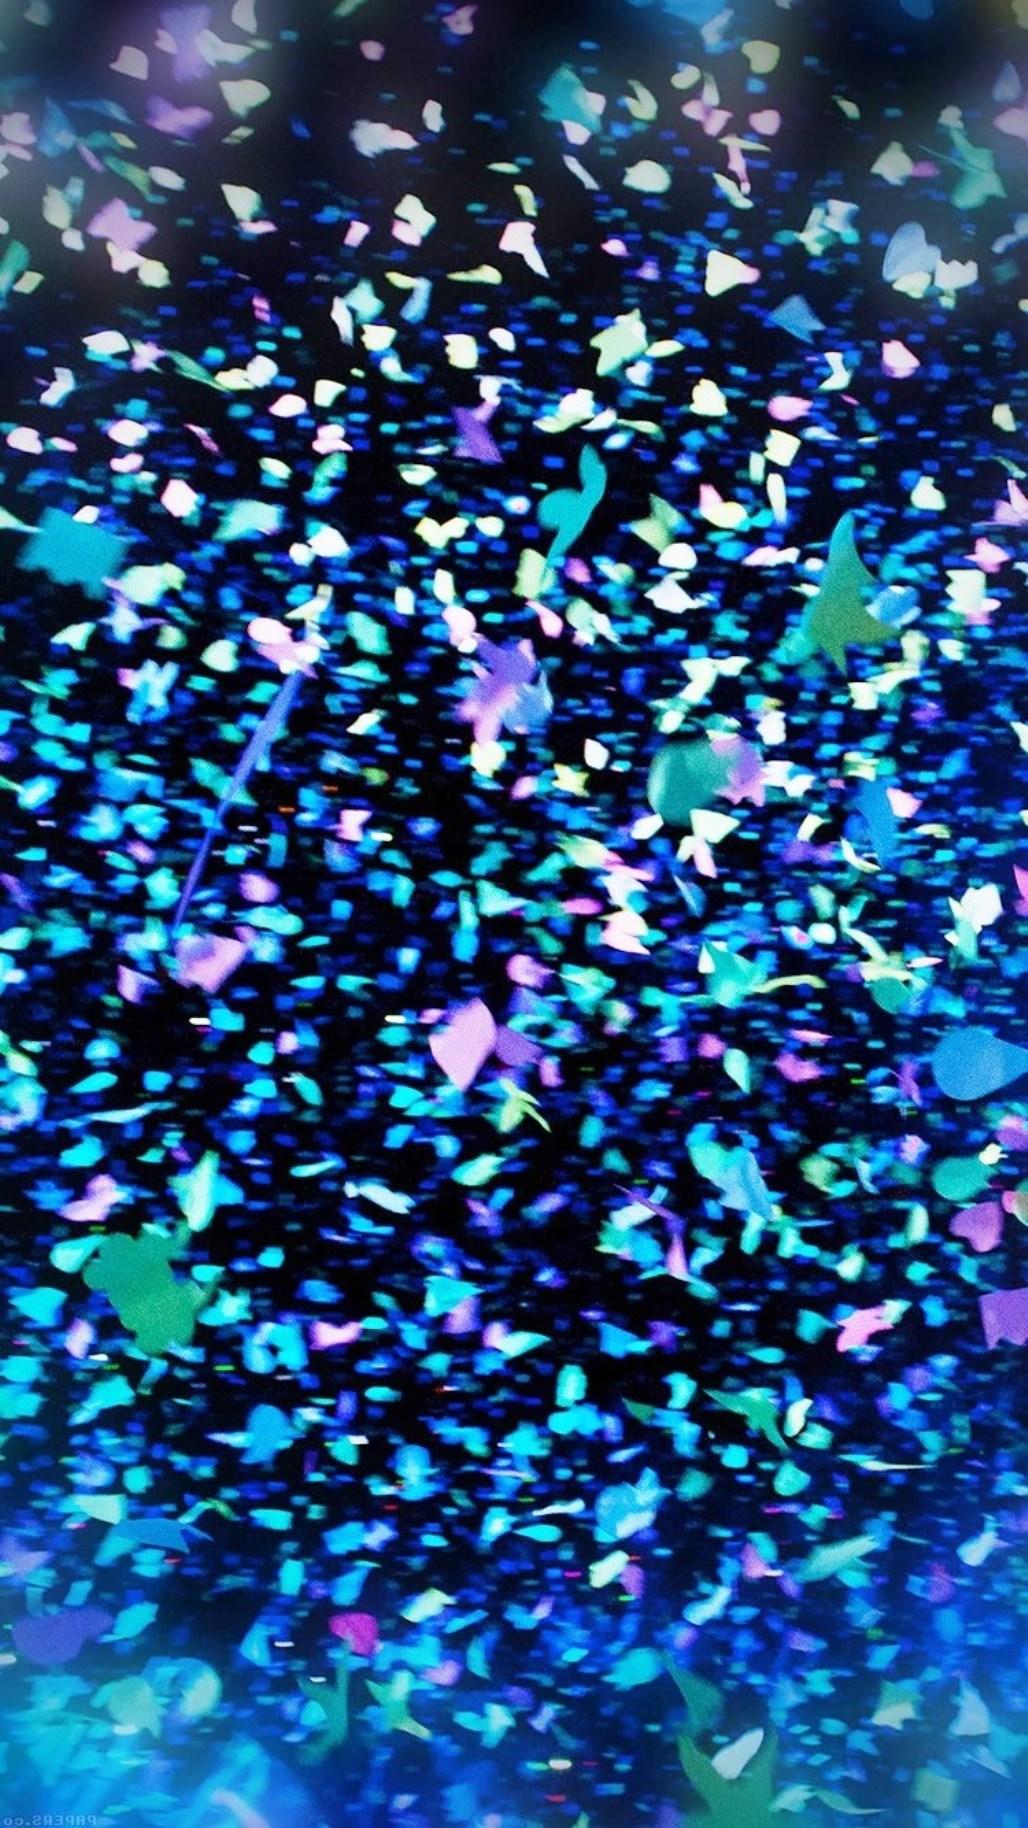 Phone Wallpapers Tumblr Group - Popular Cool Wallpaper For Iphones - HD Wallpaper